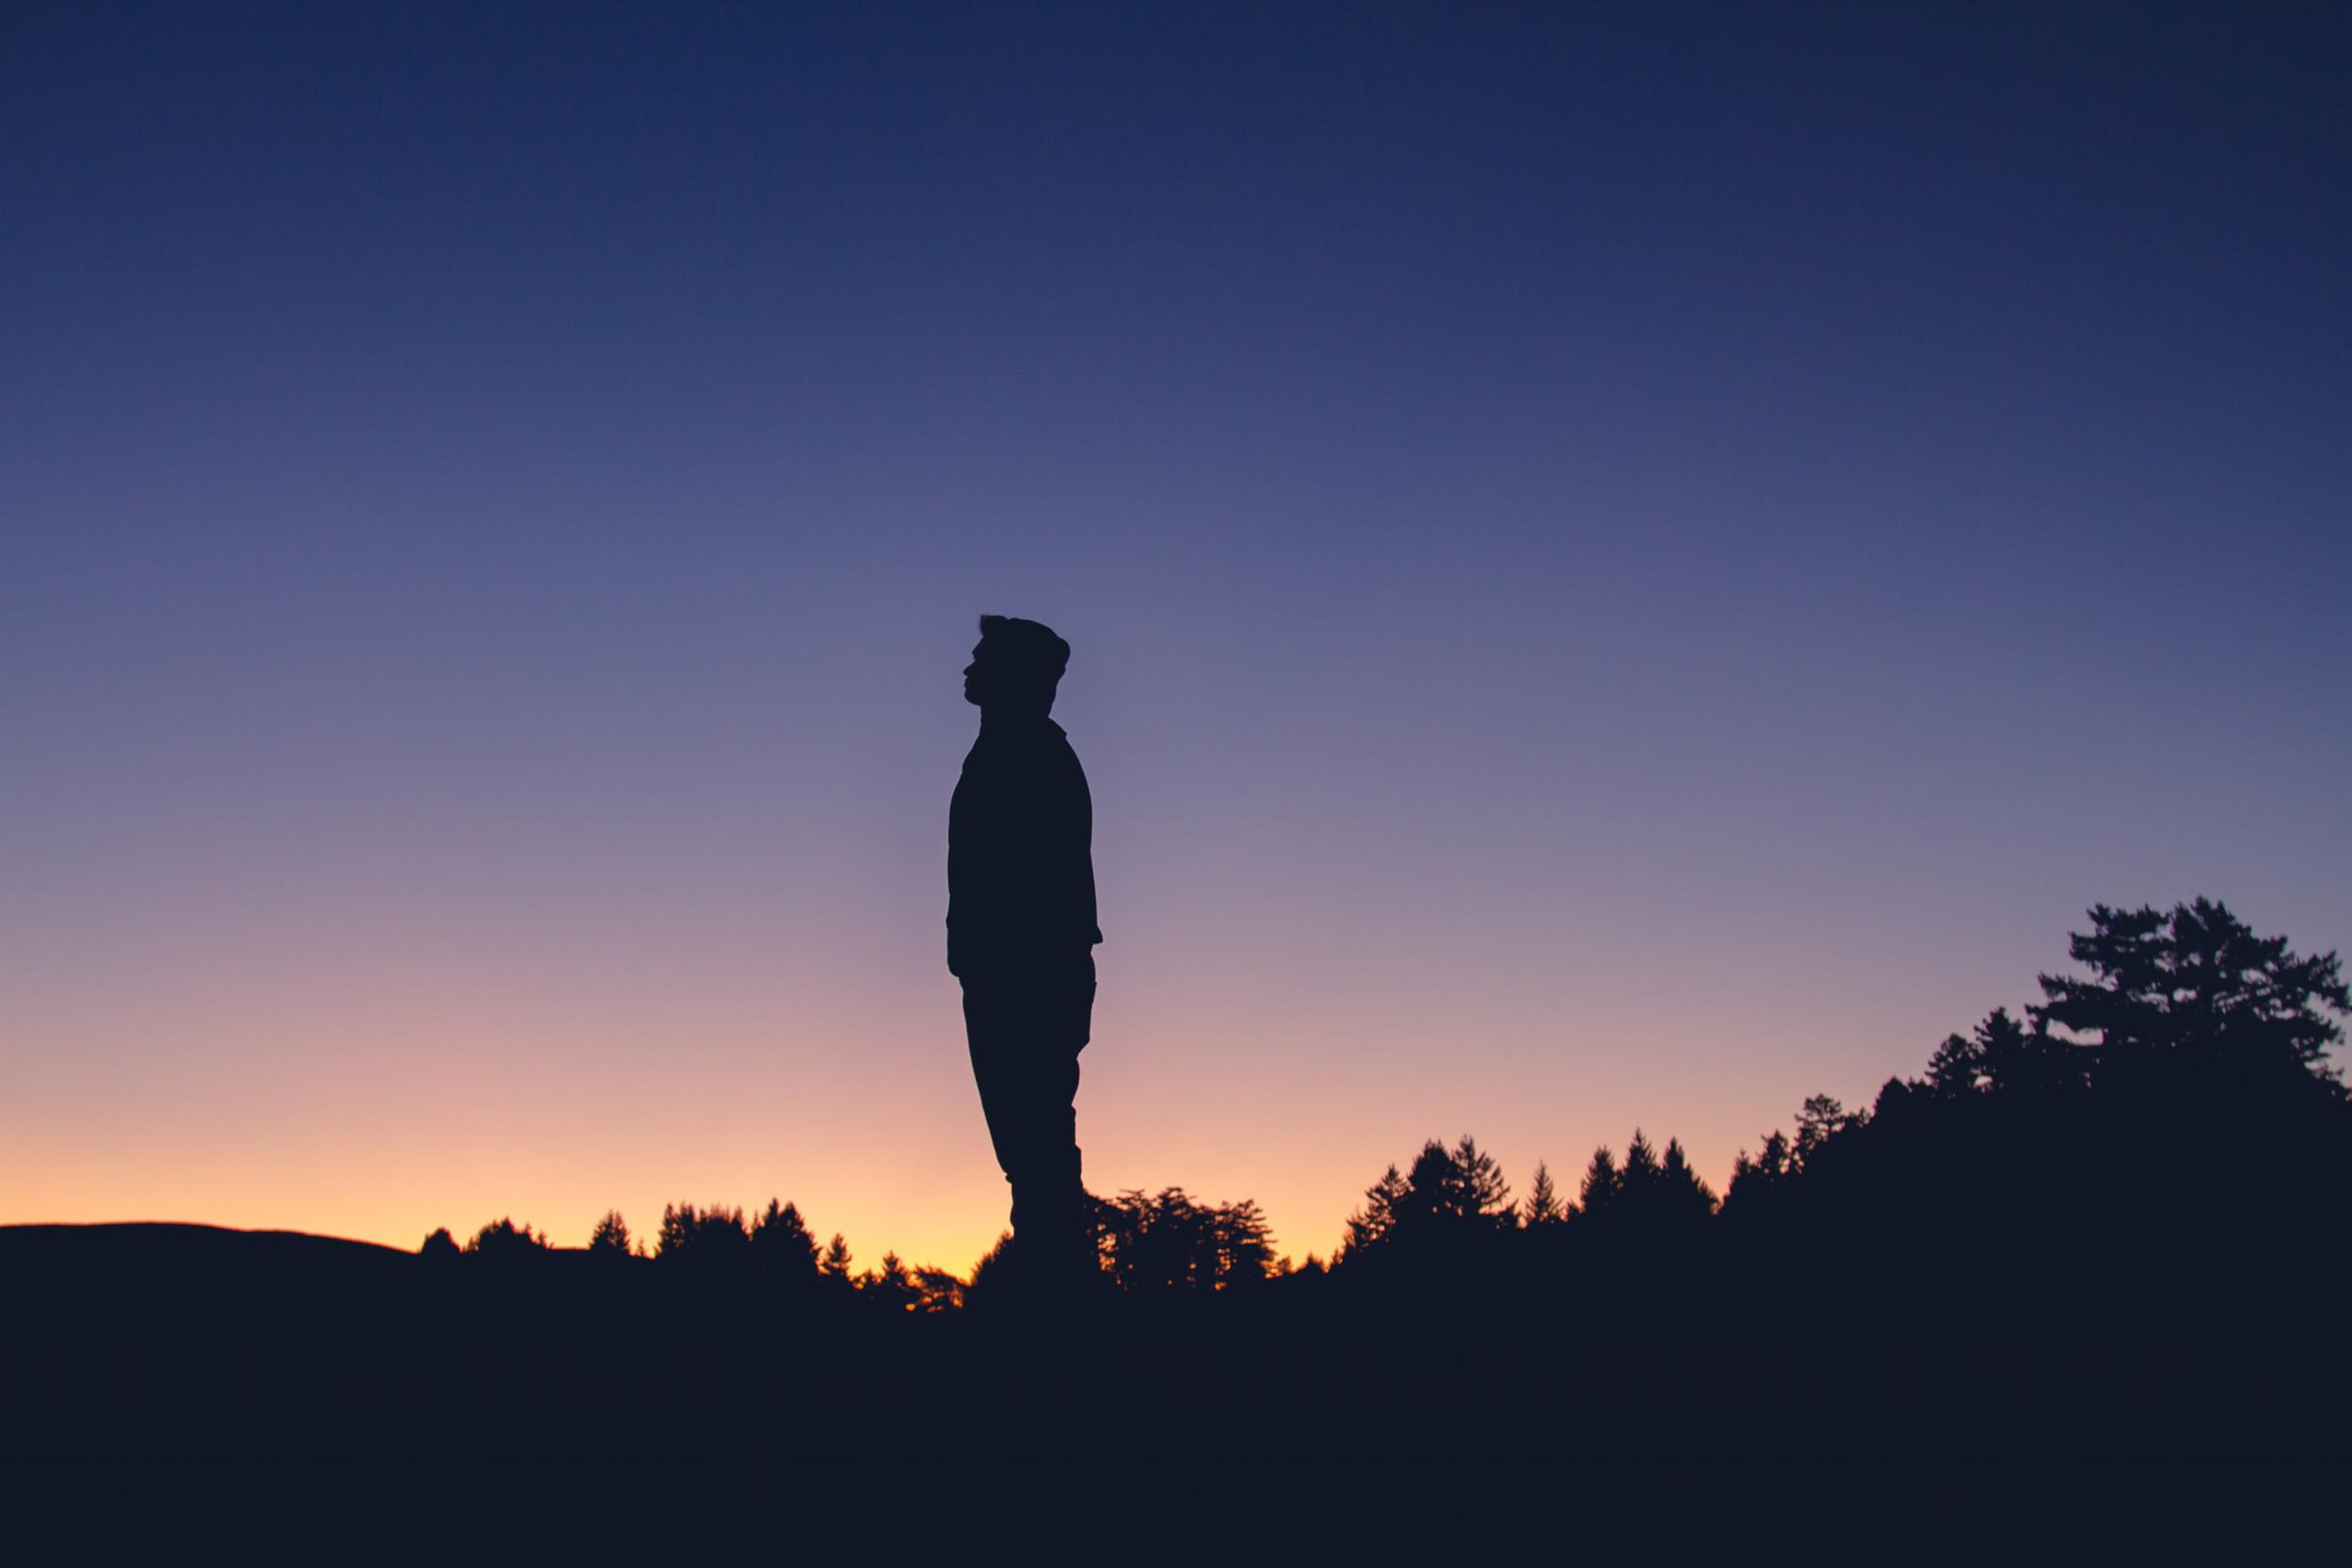 nature-sky-sunset-man.jpg